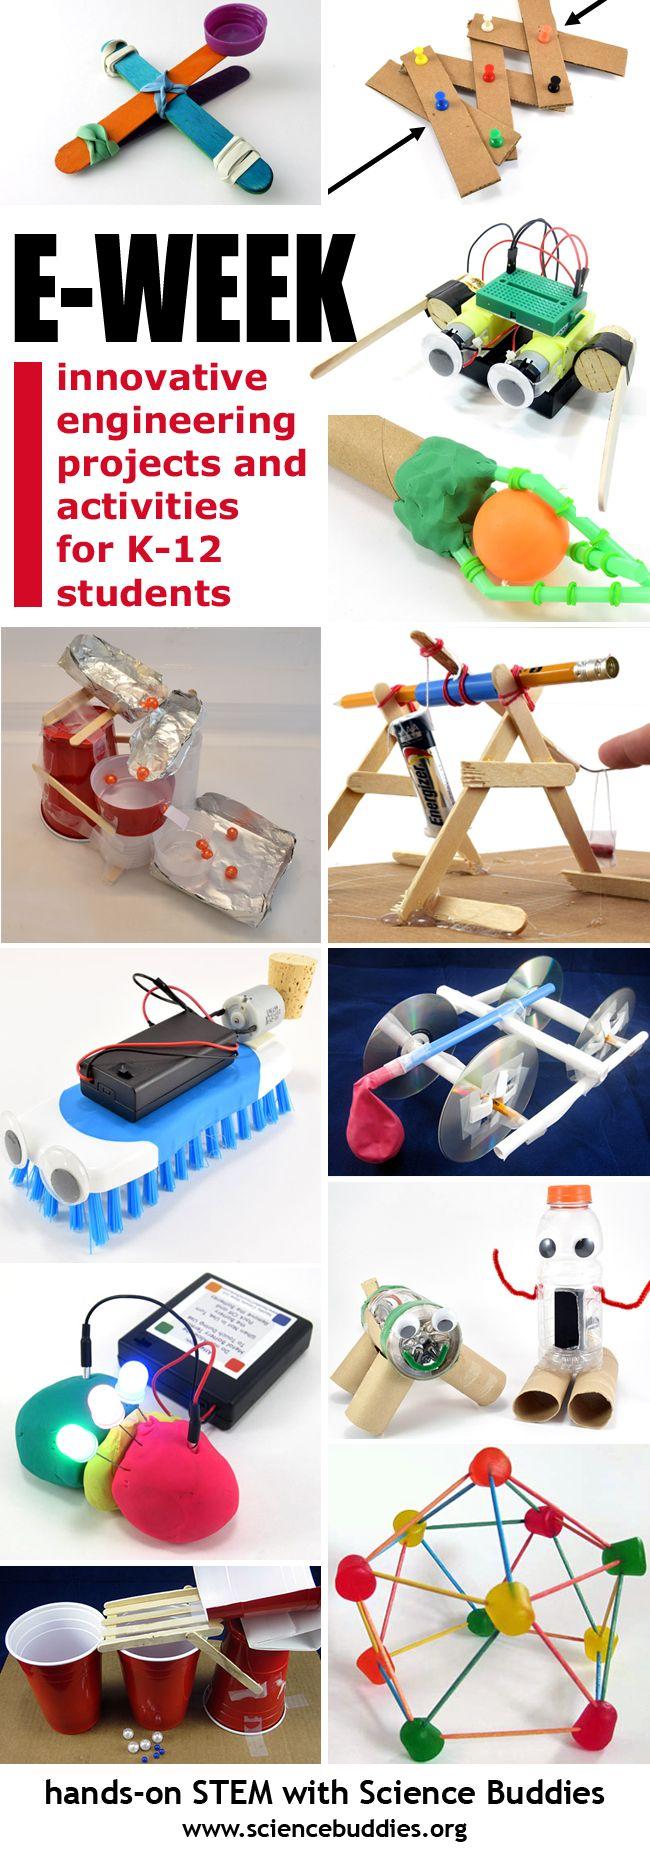 Celebrate Engineers Week! Science Buddies has great projects and activities for K-12 students. [Science Buddies, http://www.sciencebuddies.org/blog/2017/02/great-ideas-for-engineers-week-1.php?from=Pinterest] #FluorChallenge #Eweek2017 #eweek #engineering #scienceed #scienceproject